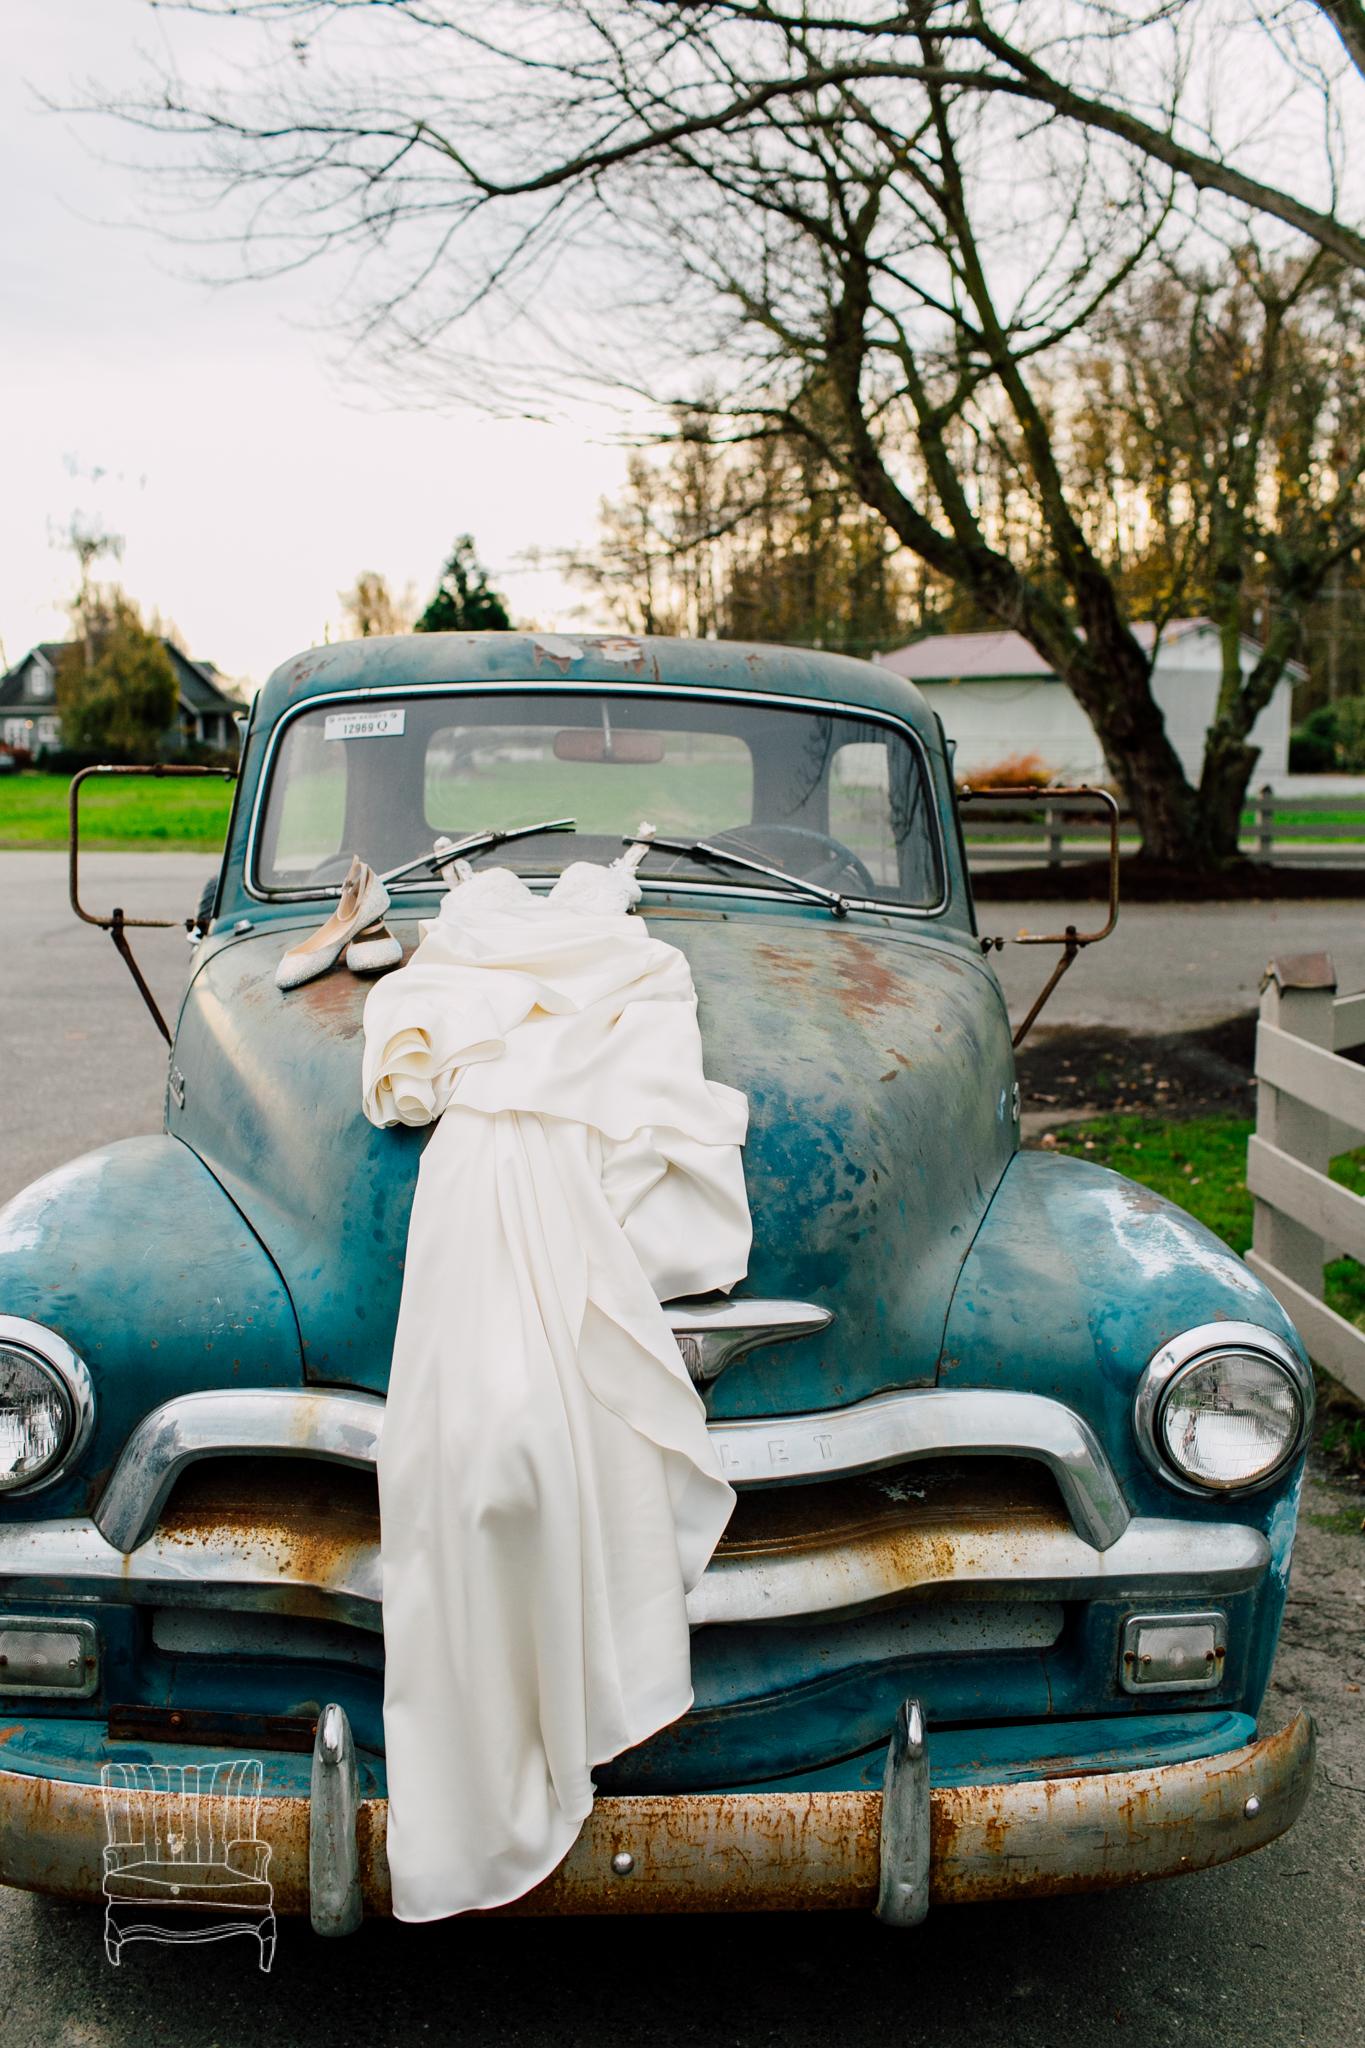 maplehurst-farm-wedding-skagit-valley-katheryn-moran-photography-2.jpg